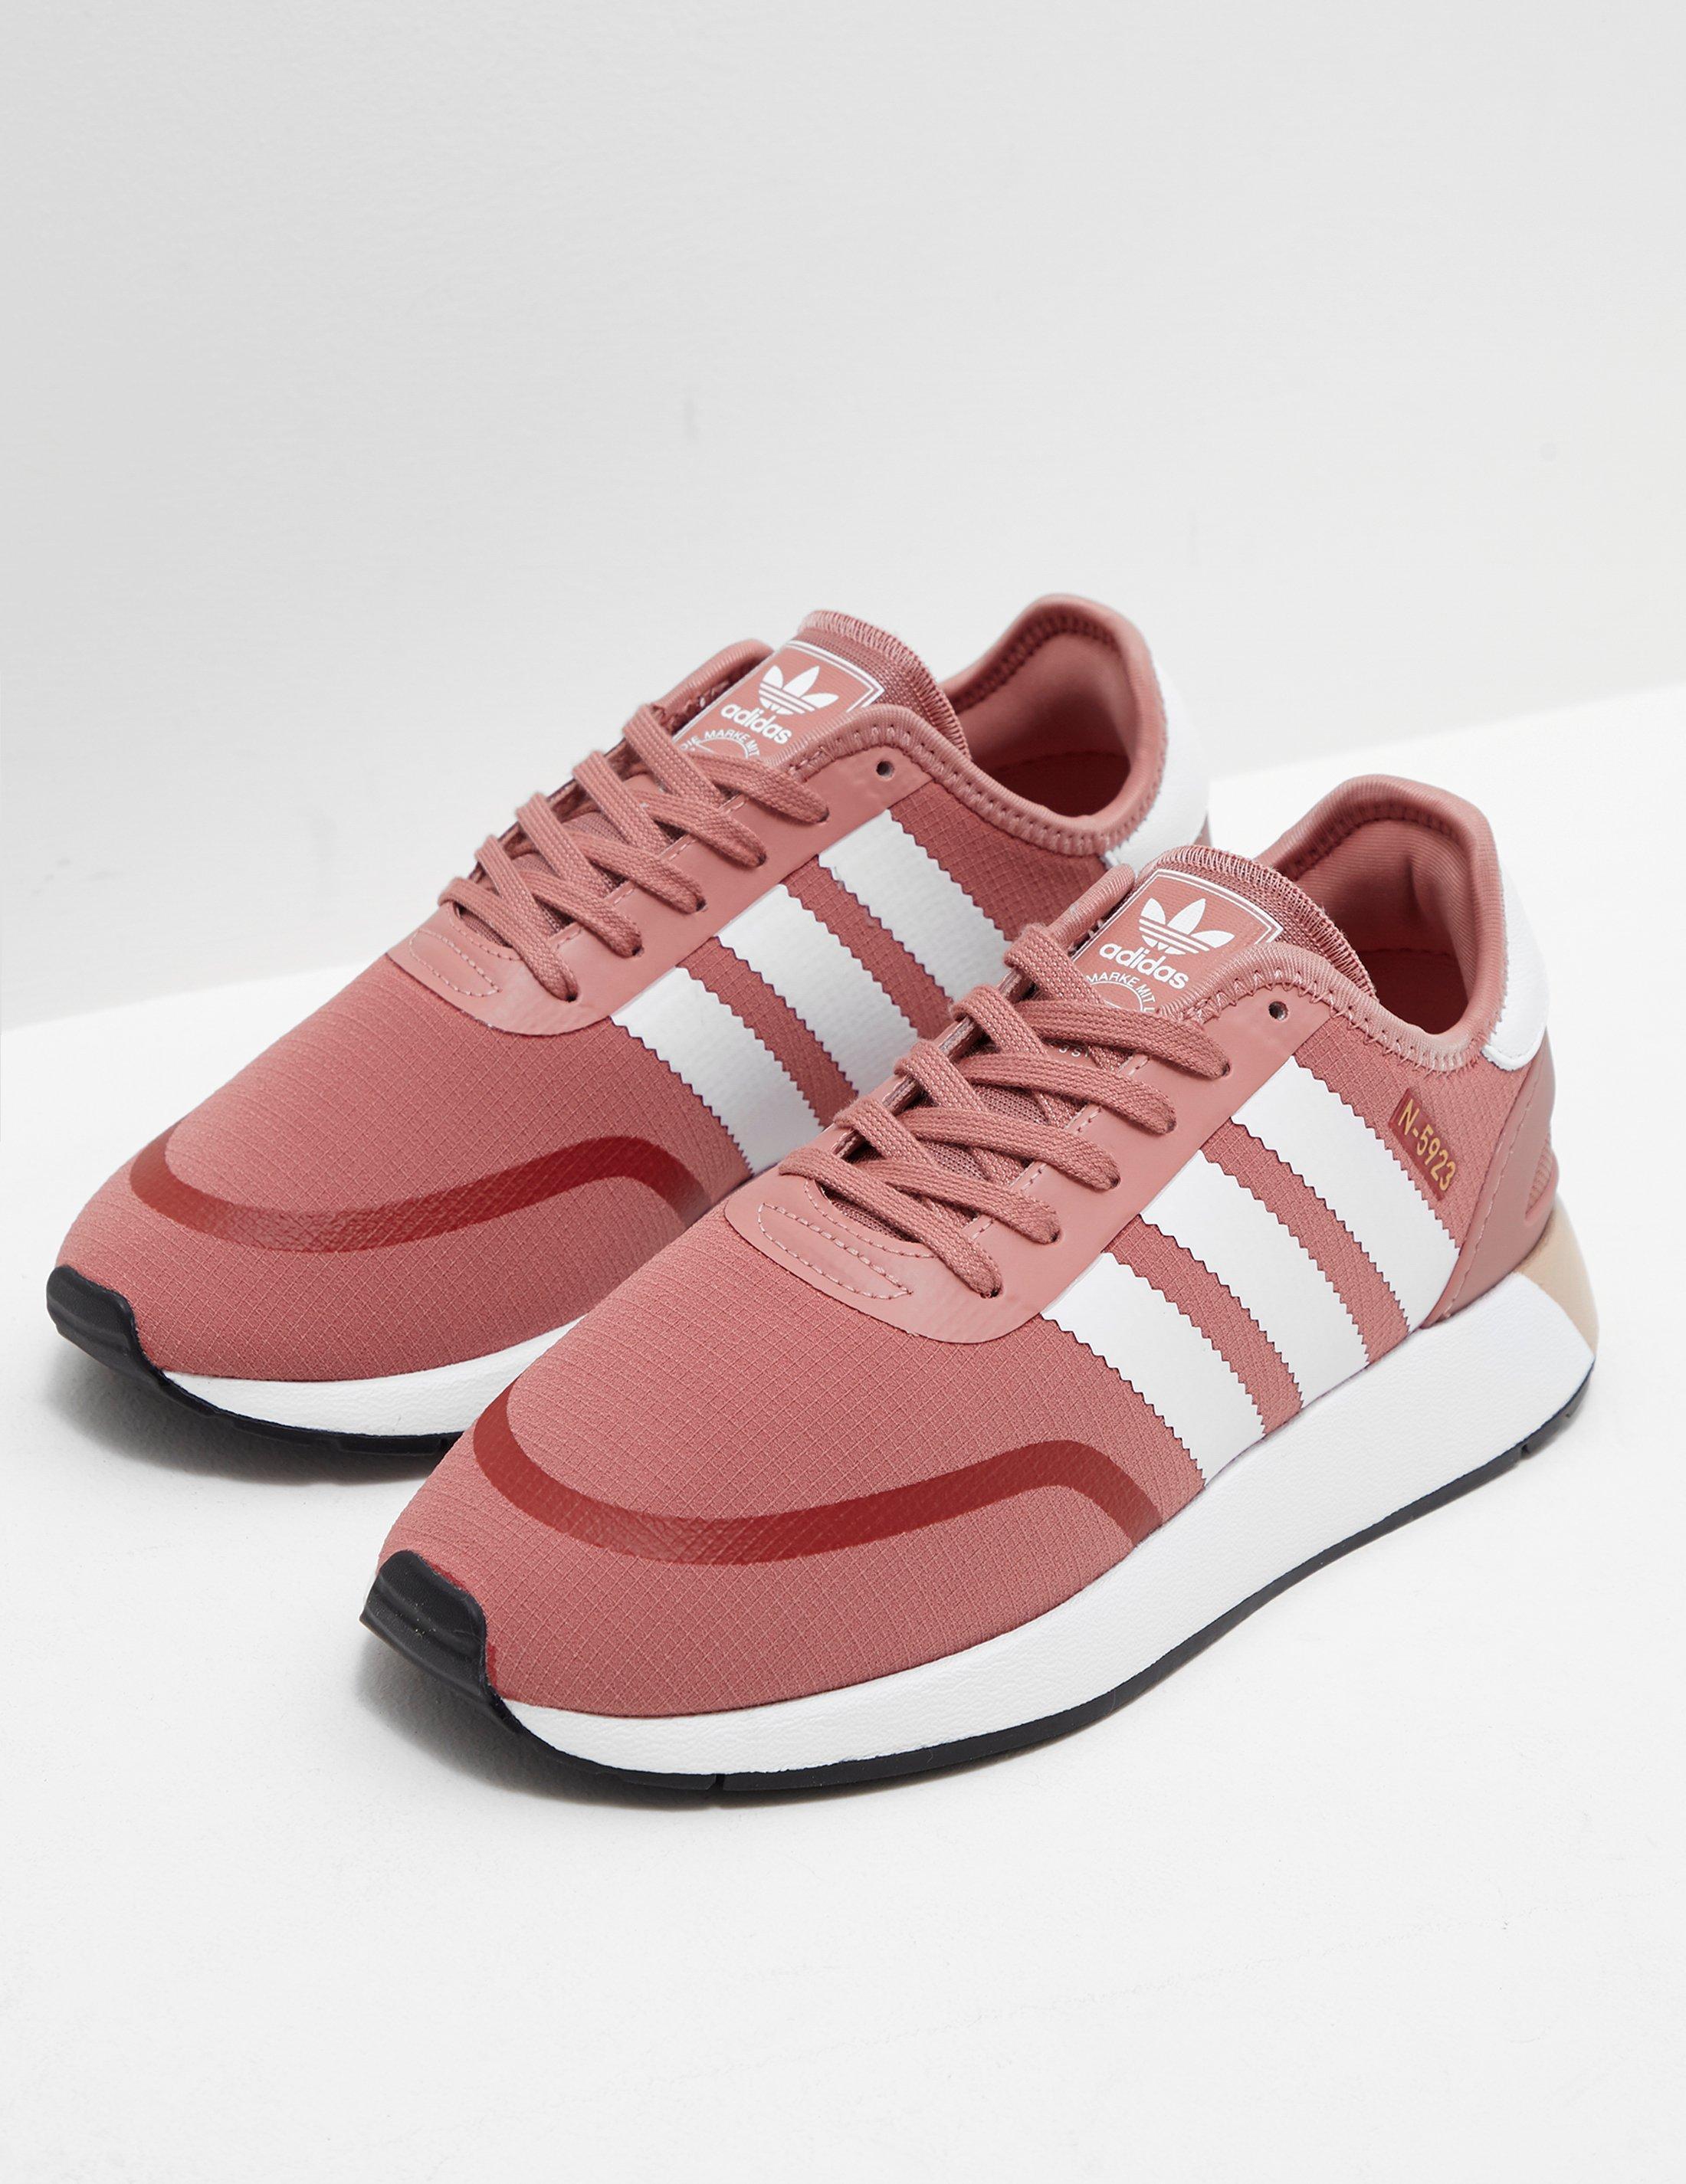 4b492c6a09d6 Lyst - adidas Originals Womens N-5923 Women s Pink white in Pink